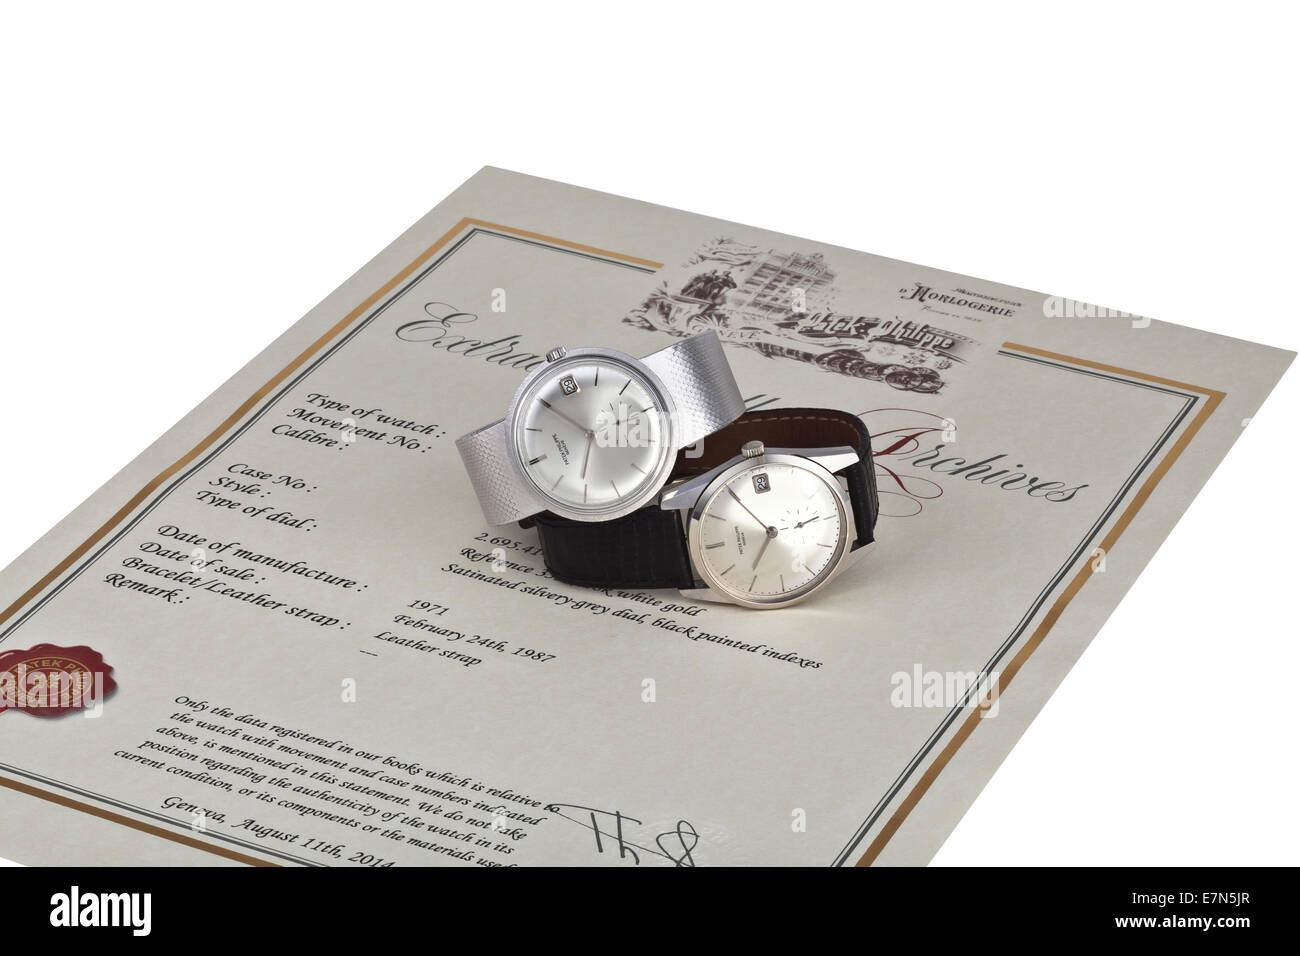 Patek Philippe Wrist Watch - Stock Image